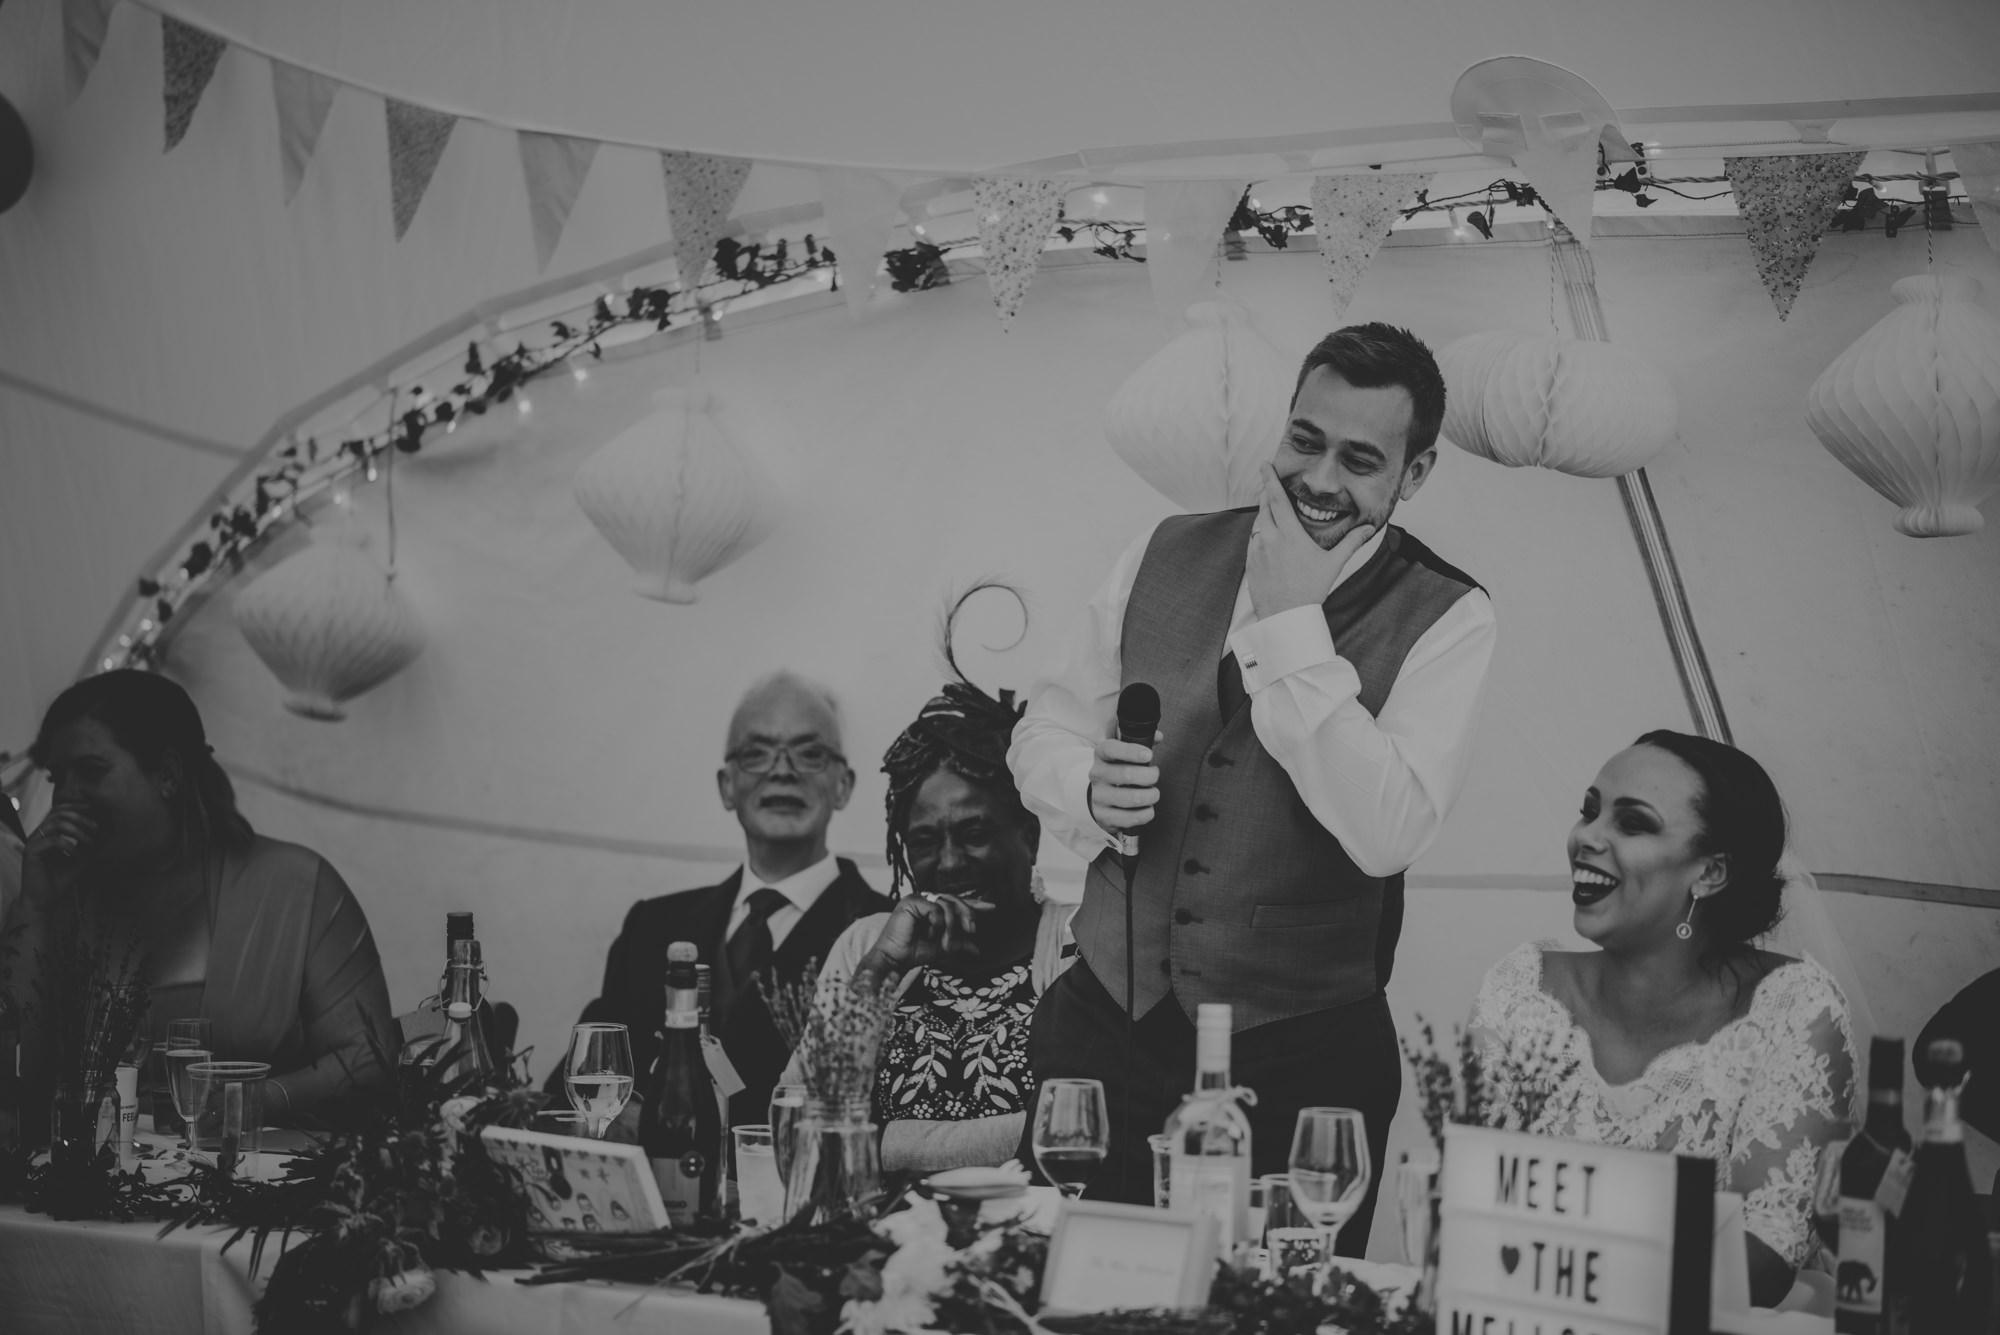 Jacqueline-Gareth-Wedding-Westmead-Events-Surrey-Manu-Mendoza-Wedding-Photography-420.jpg